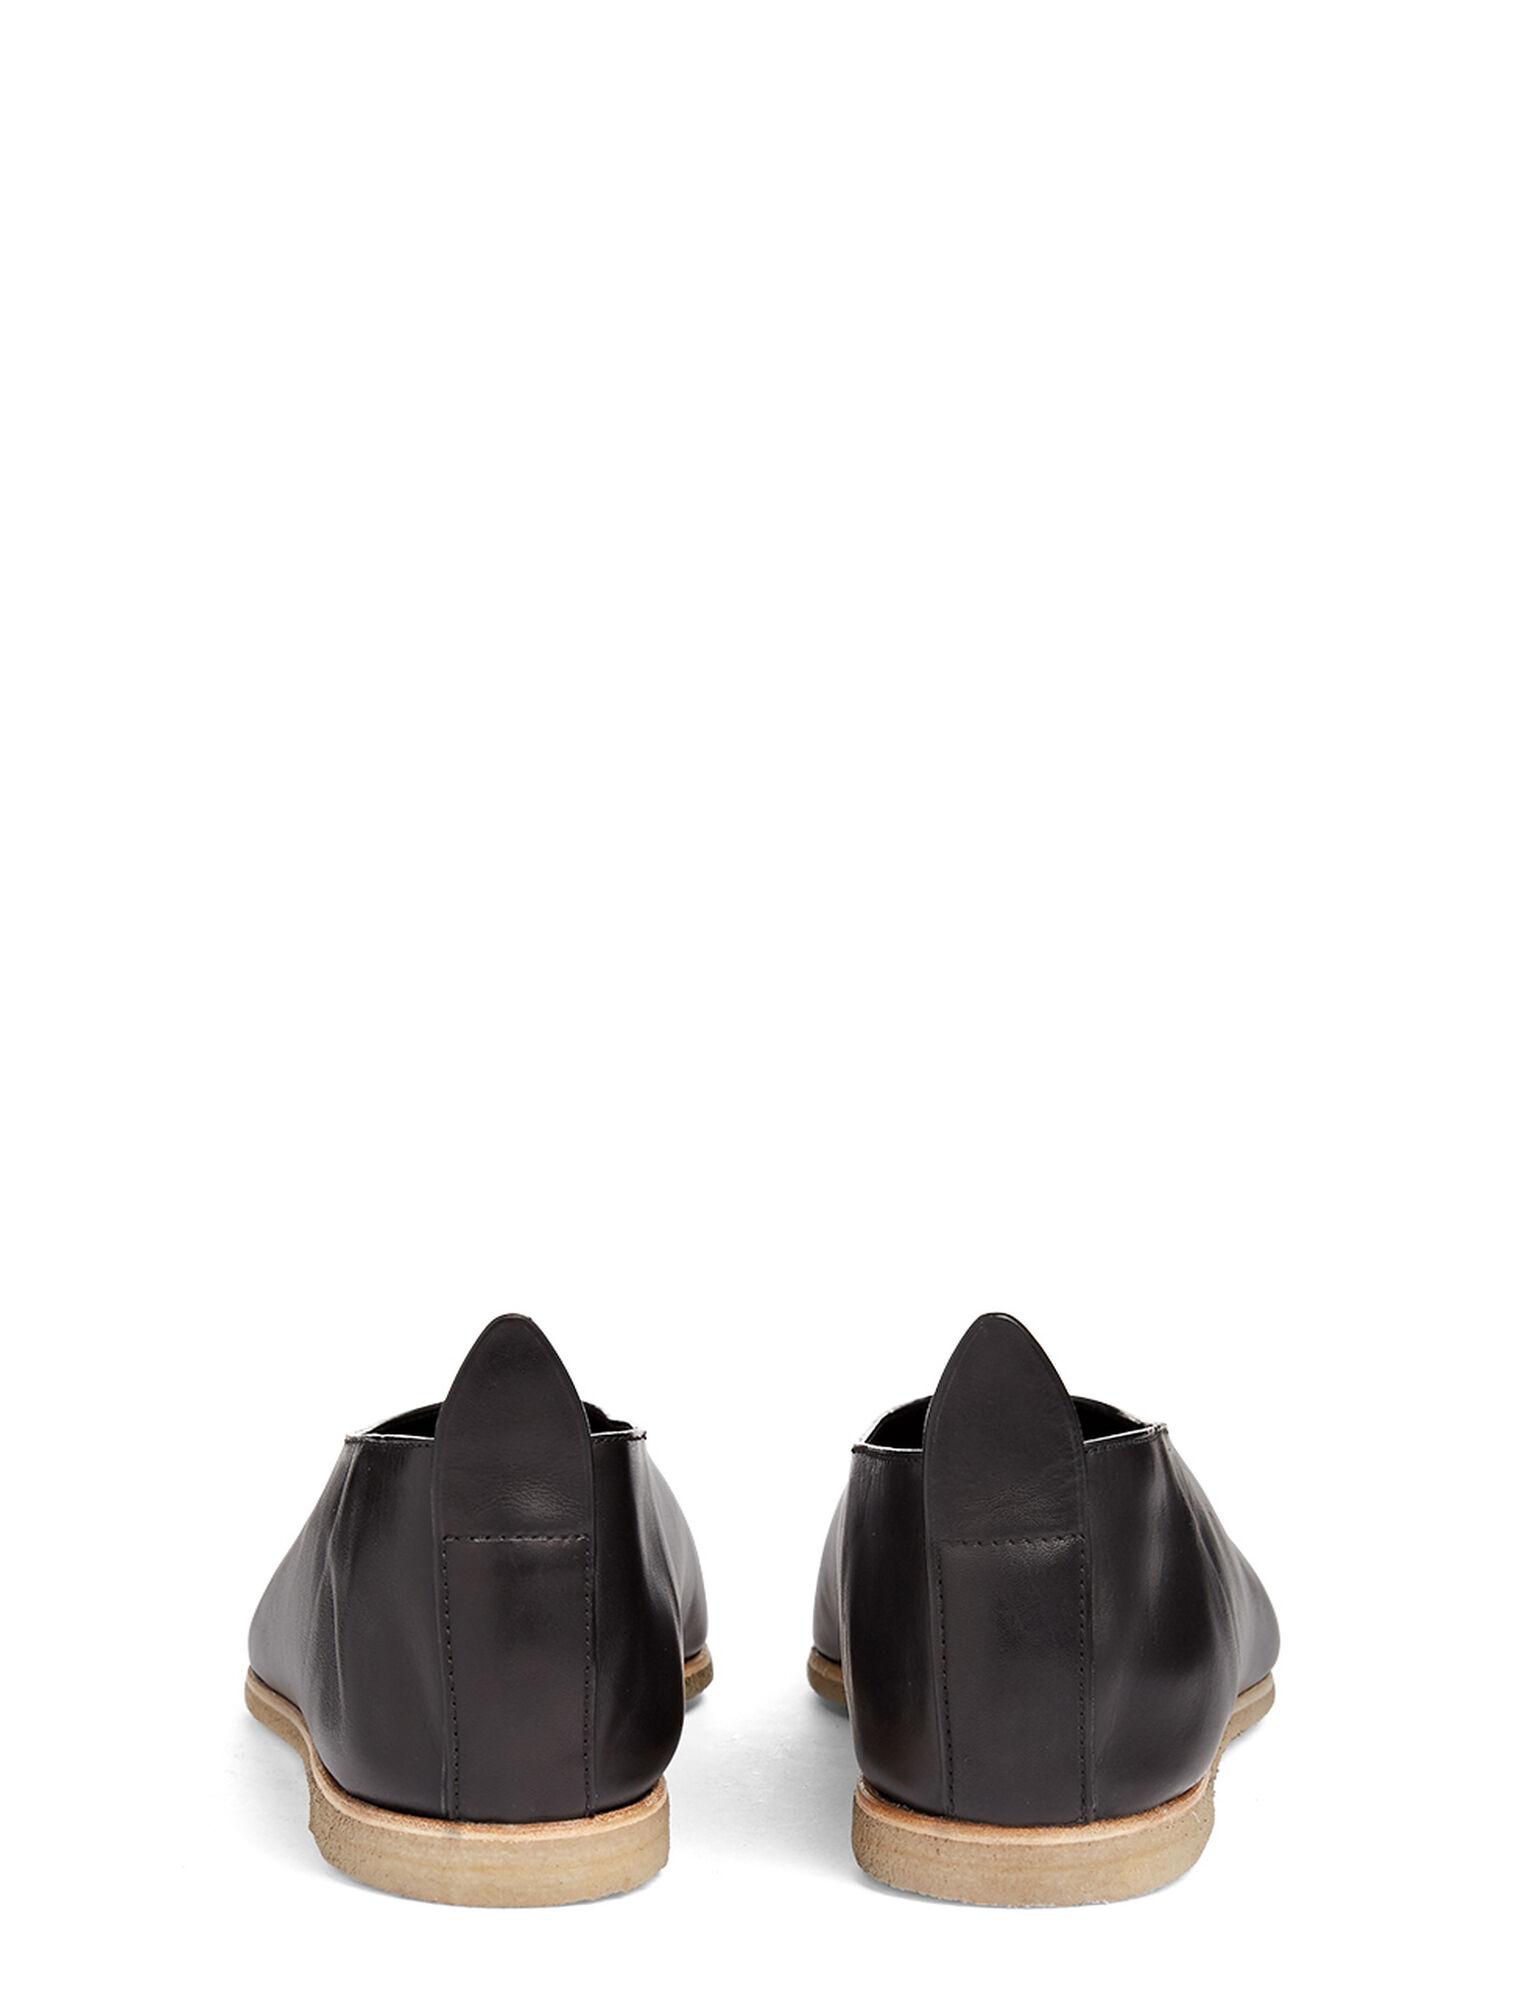 Joseph, Calf Leather Ballerina, in BLACK